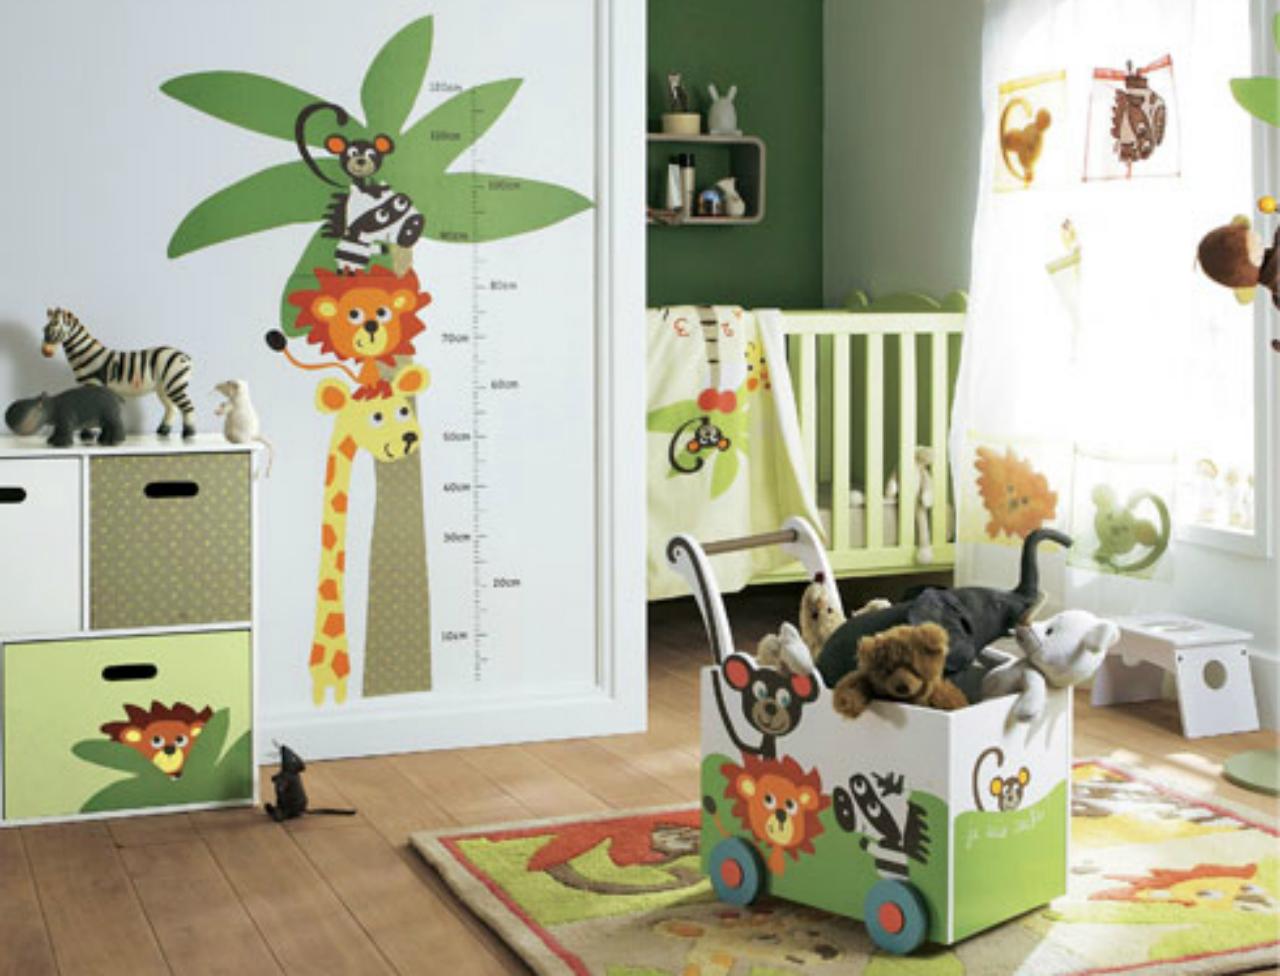 deco jungle pour bebe. Black Bedroom Furniture Sets. Home Design Ideas